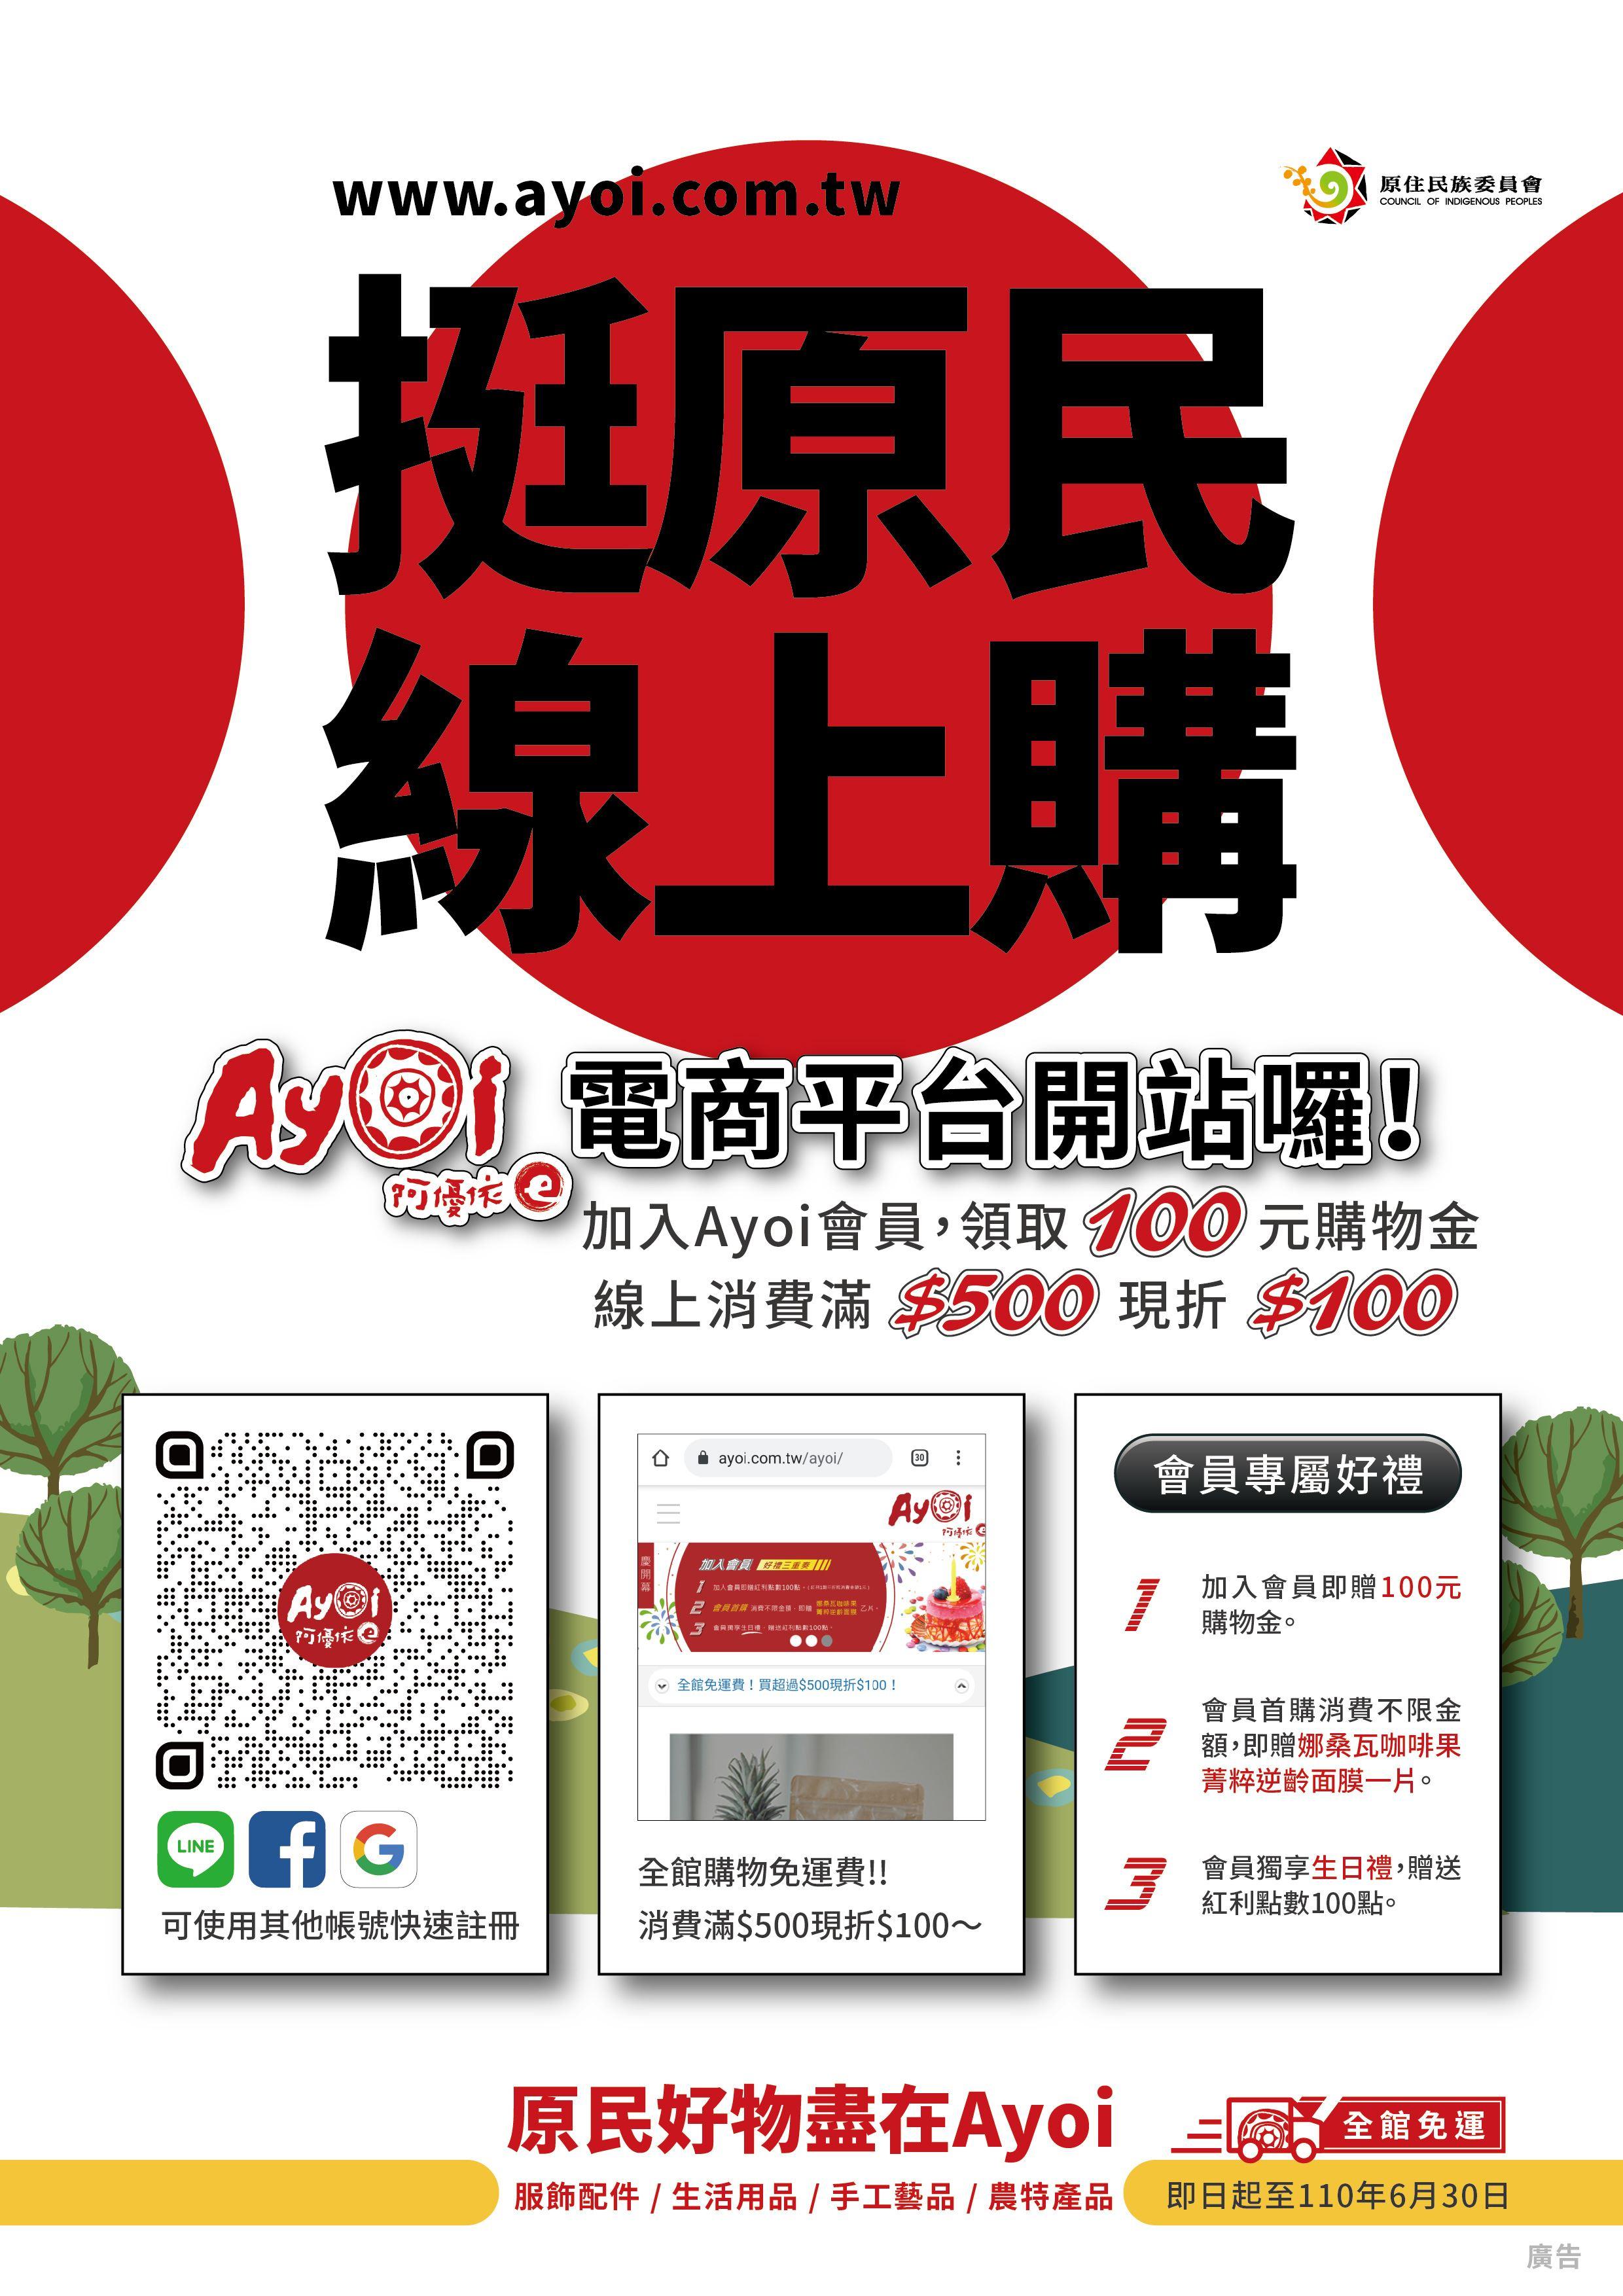 Ayoi阿優依電商平台優惠活動